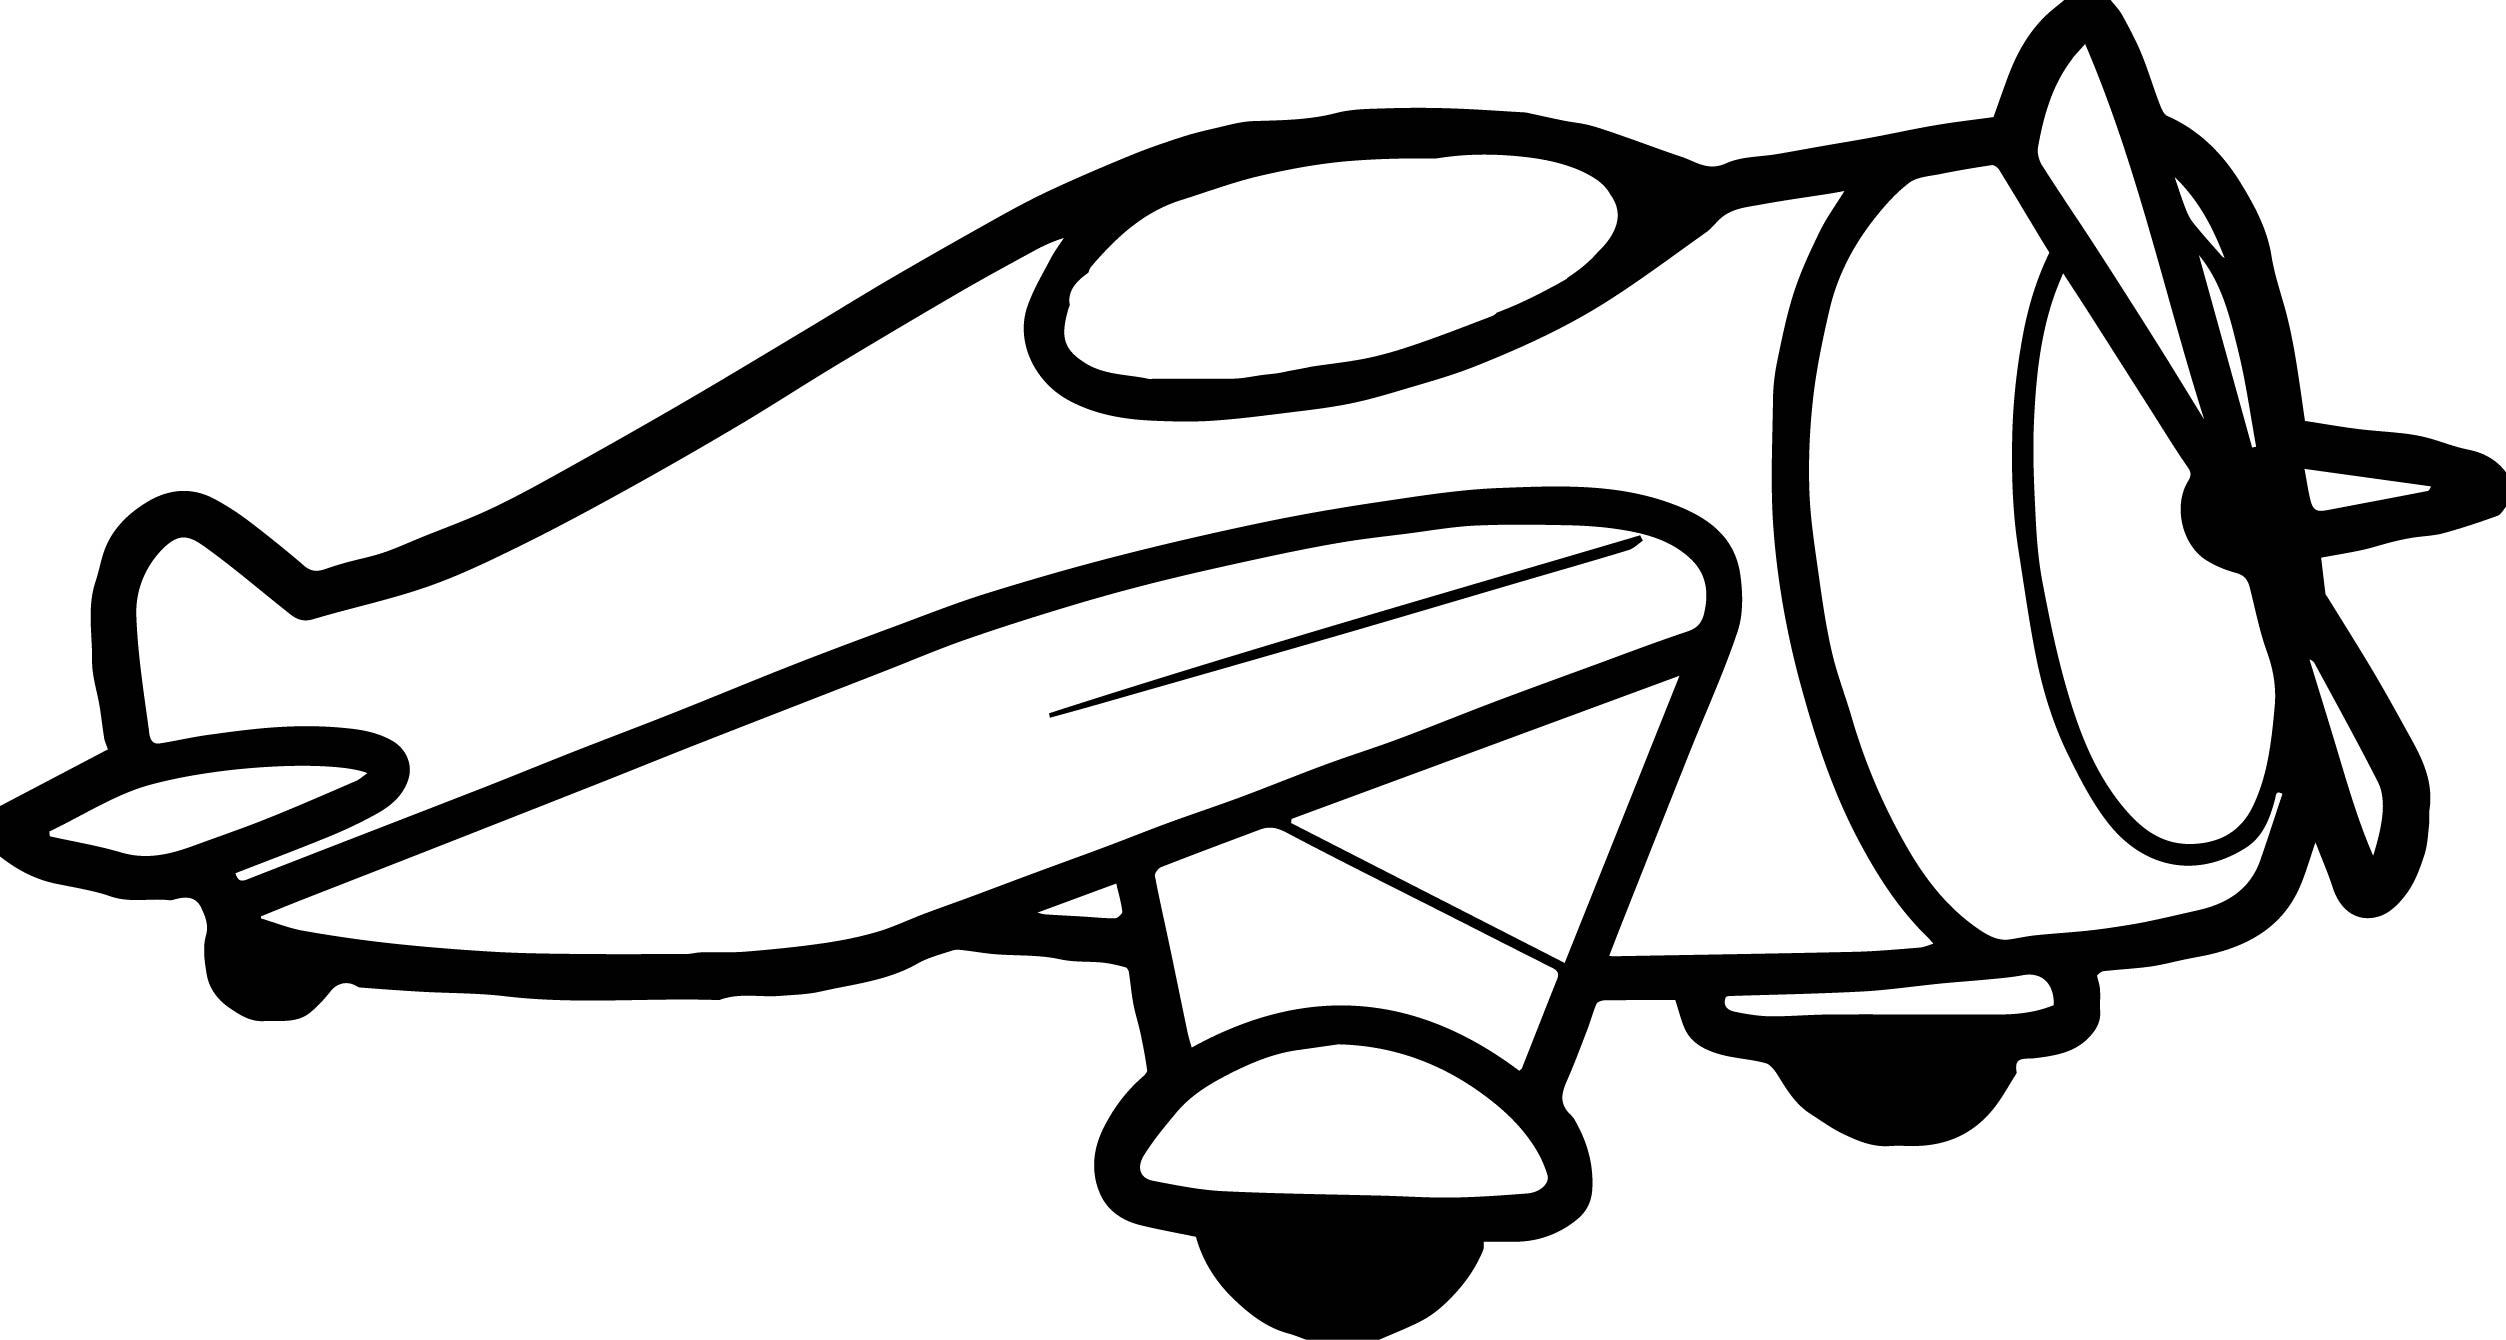 Large Funny Airplane Ubuplane Coloring Page